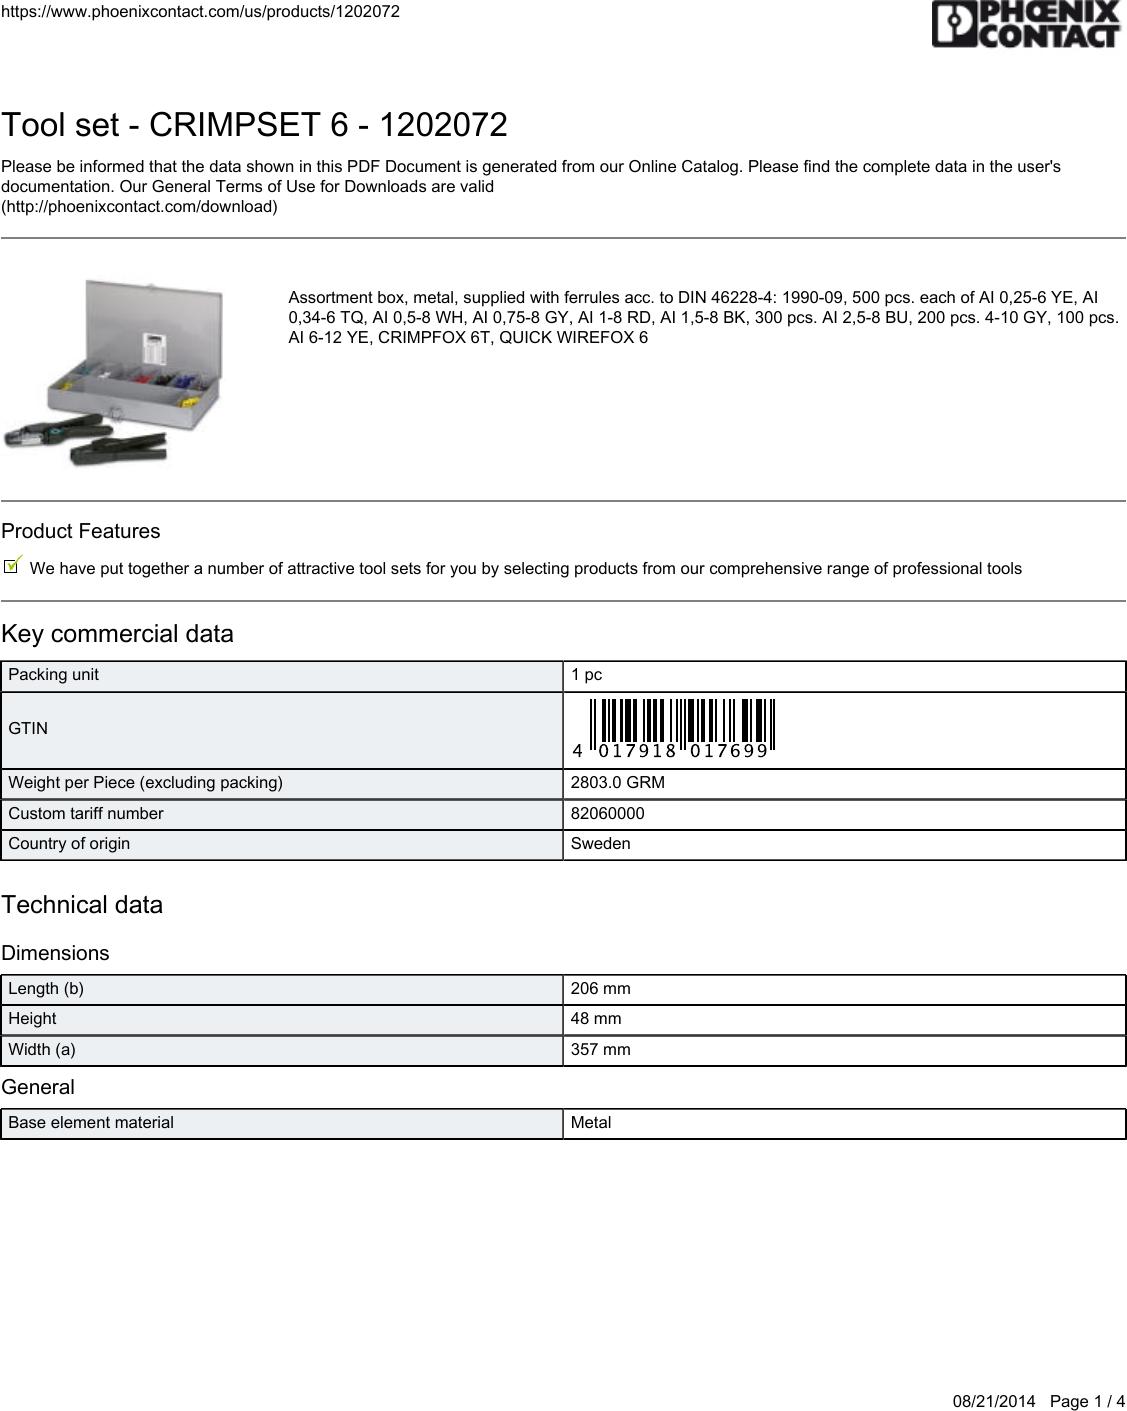 PHOENIX CONTACT FERRULE INSULATED RED AI 1-8 RD  3200030 100//PACK